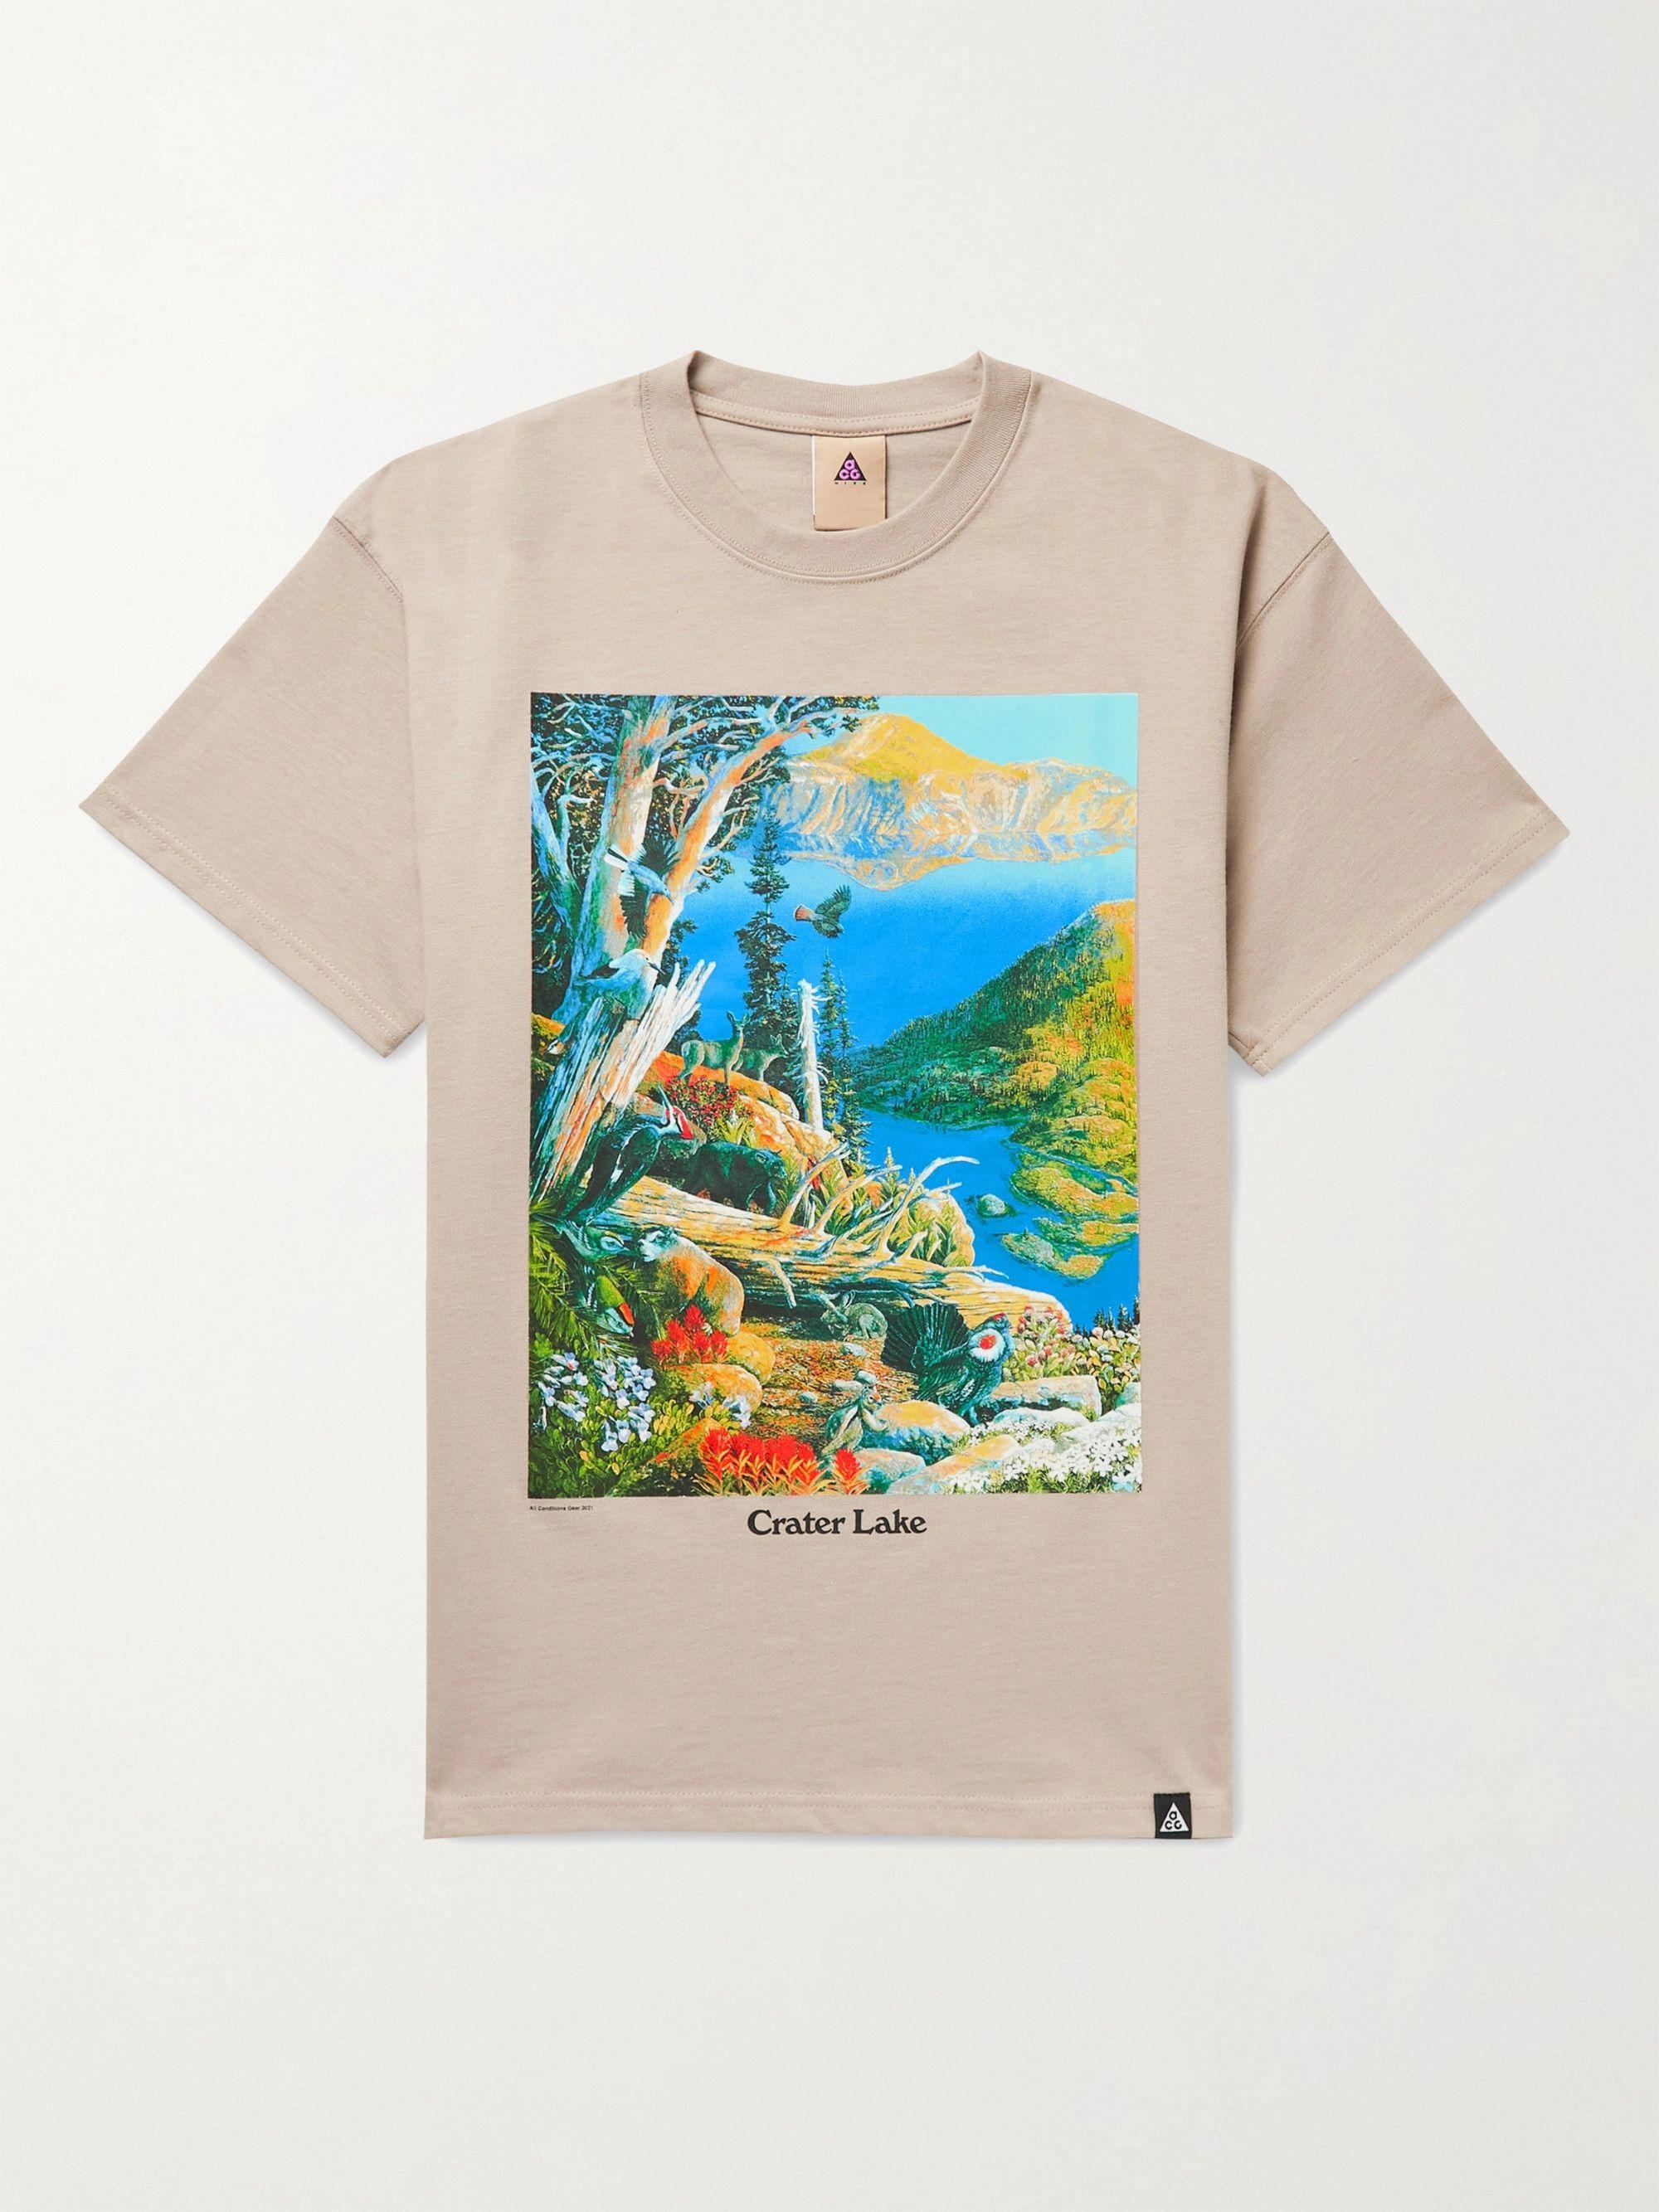 NIKE ACG NRG Crater Lake Printed Cotton-Jersey T-Shirt